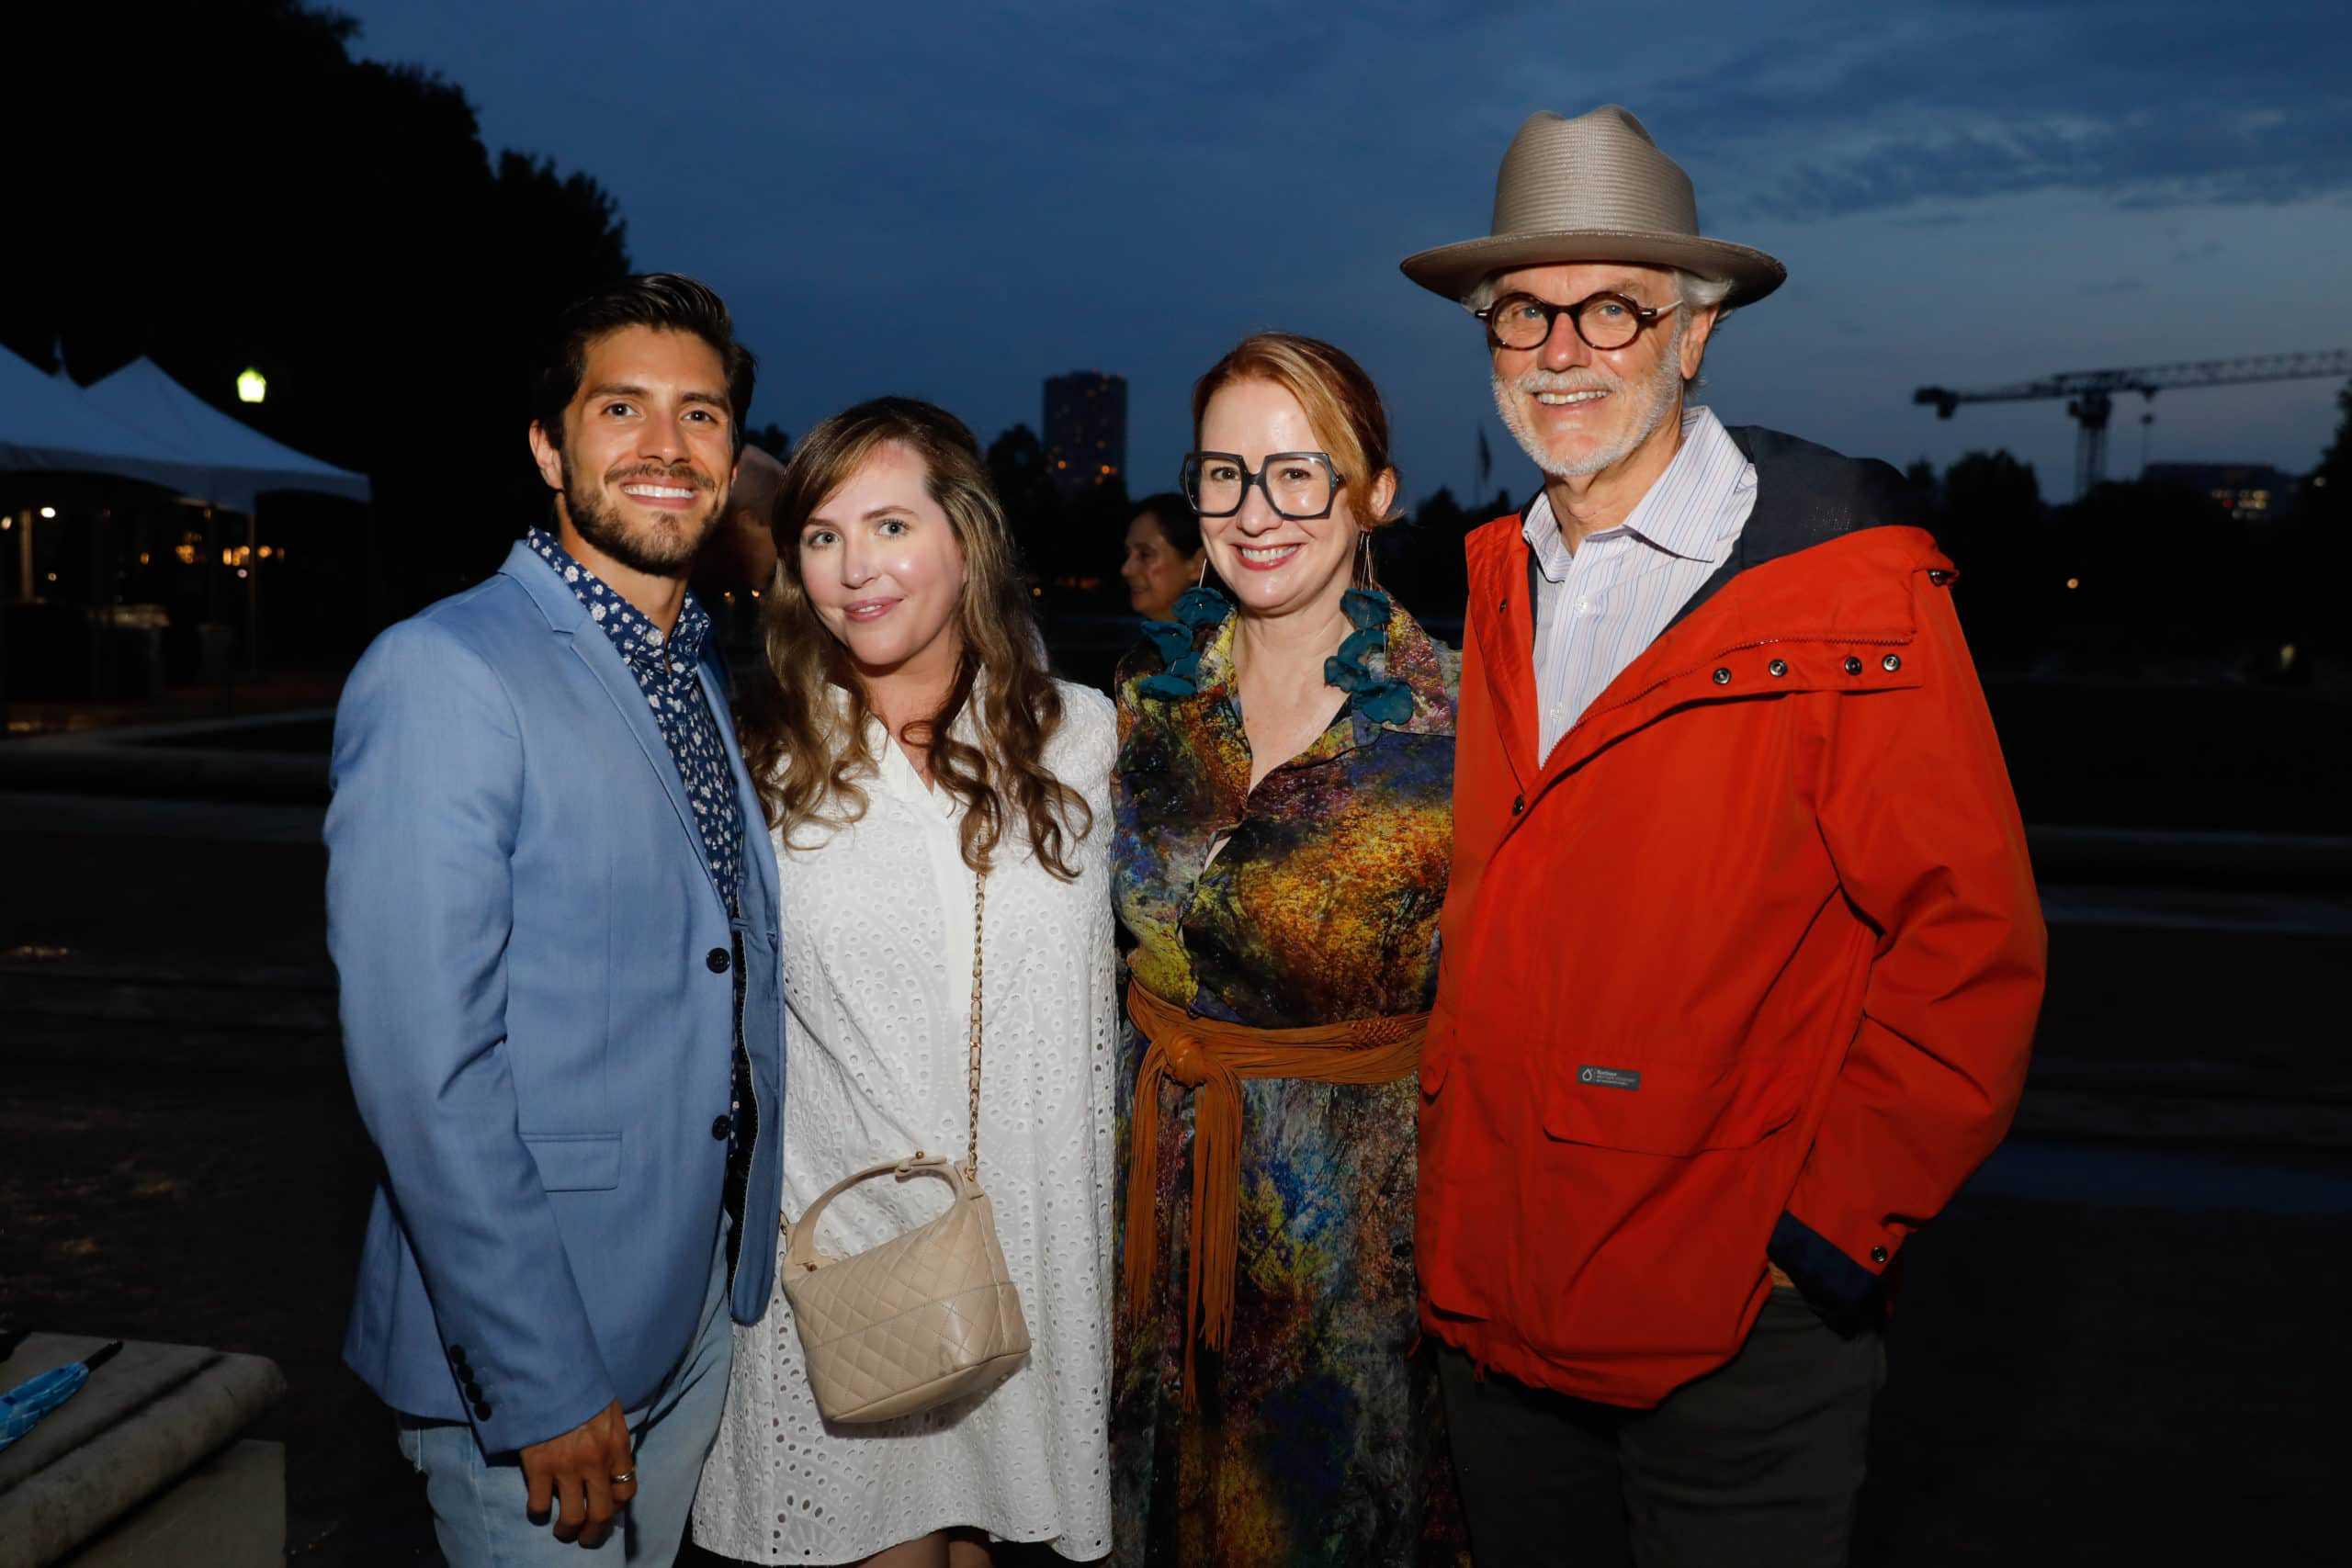 Sal Montes, Mary Patton, Rebekah Johnson and Randy Twaddle